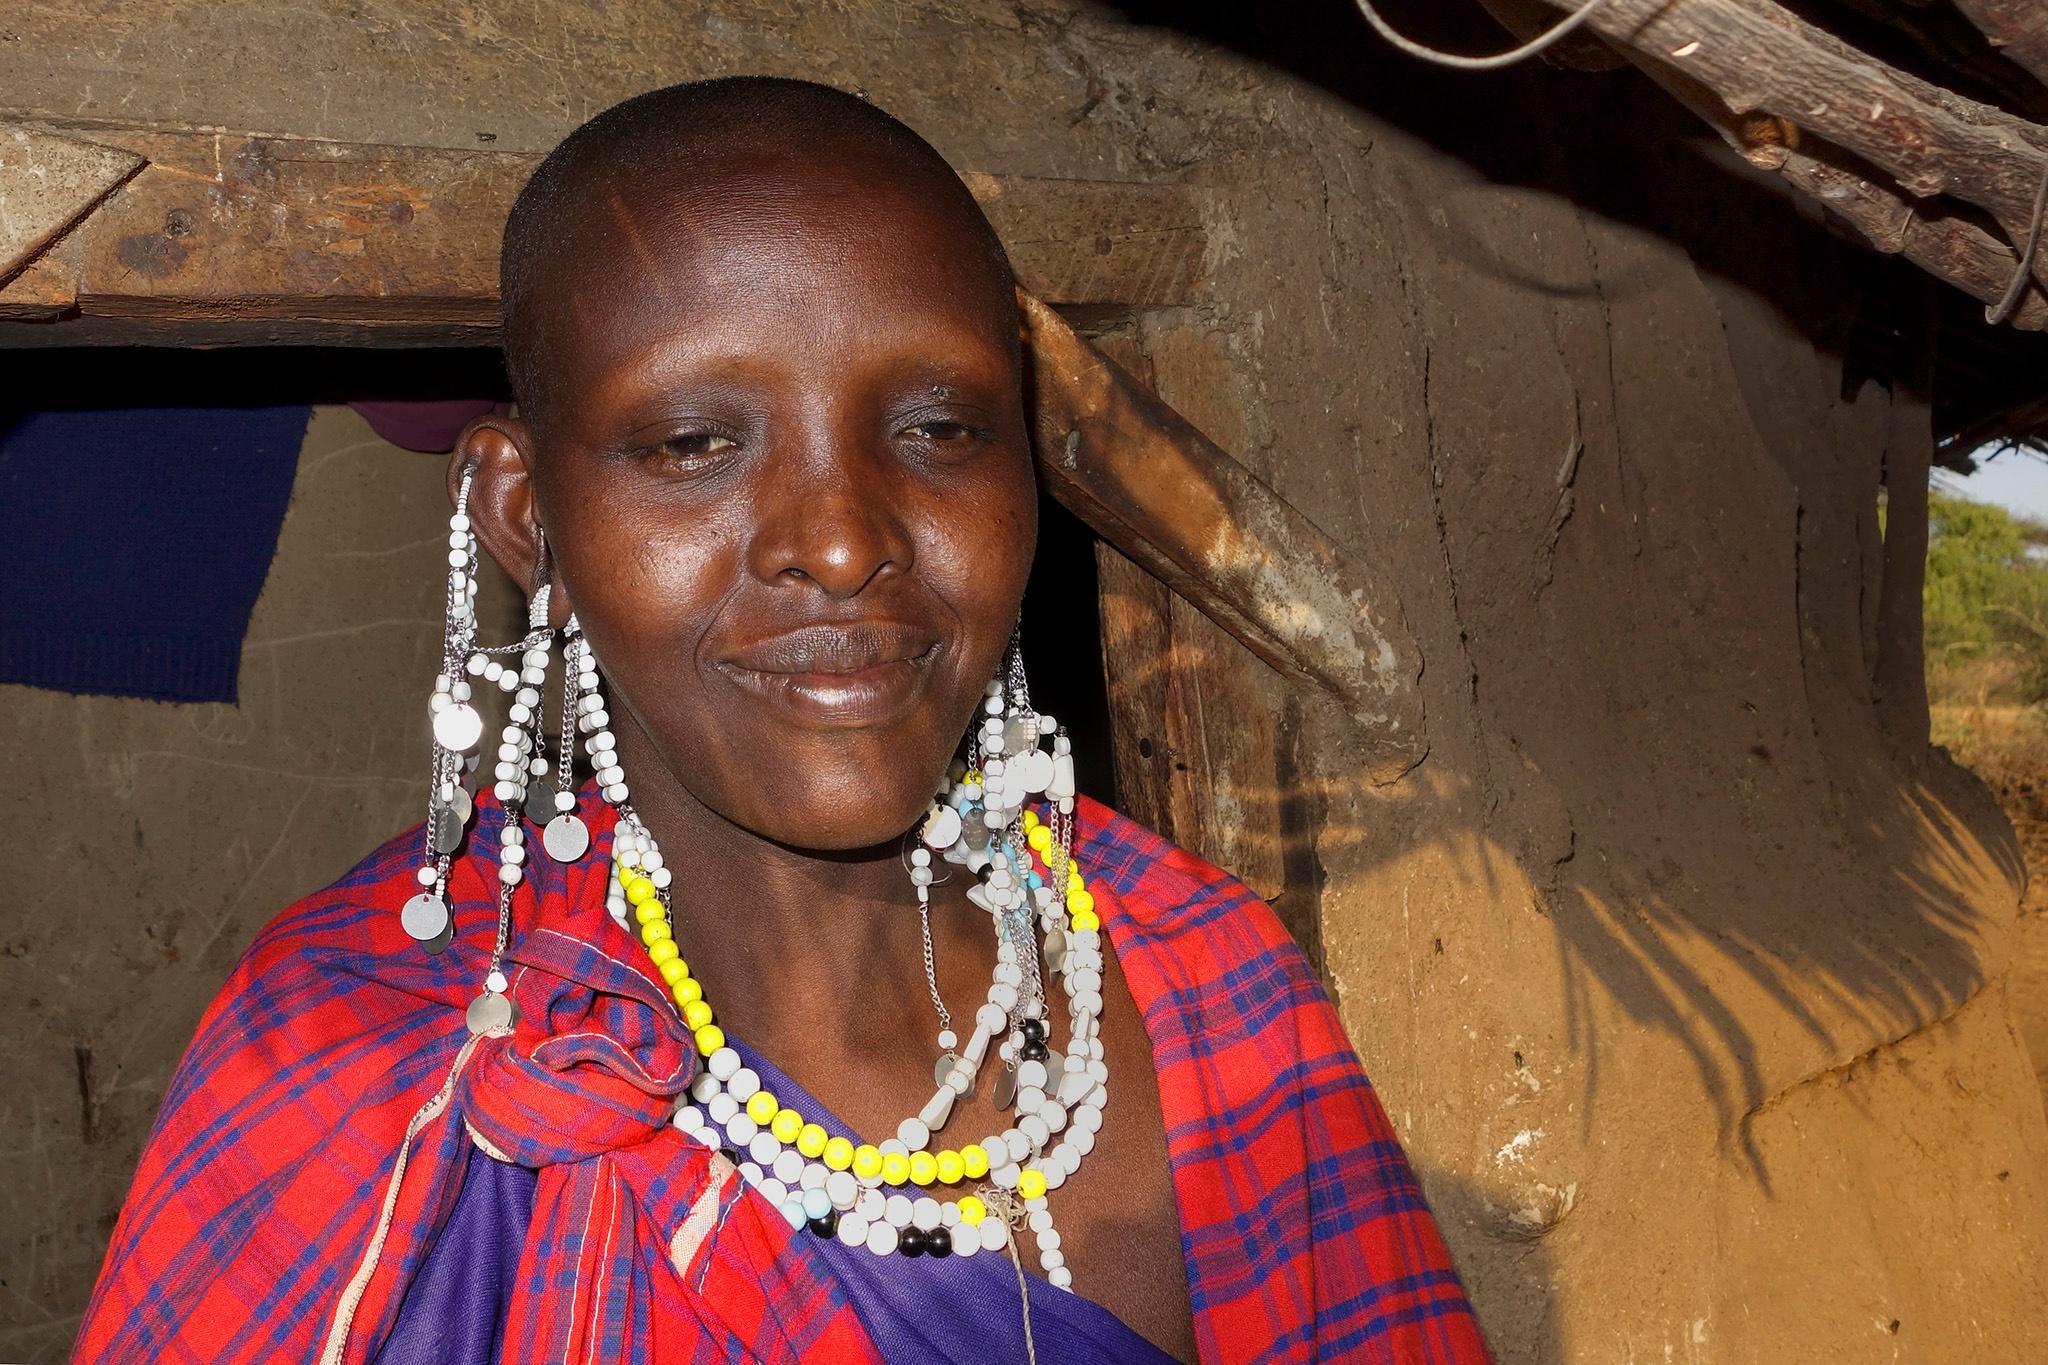 Maasai by Markus Scholz